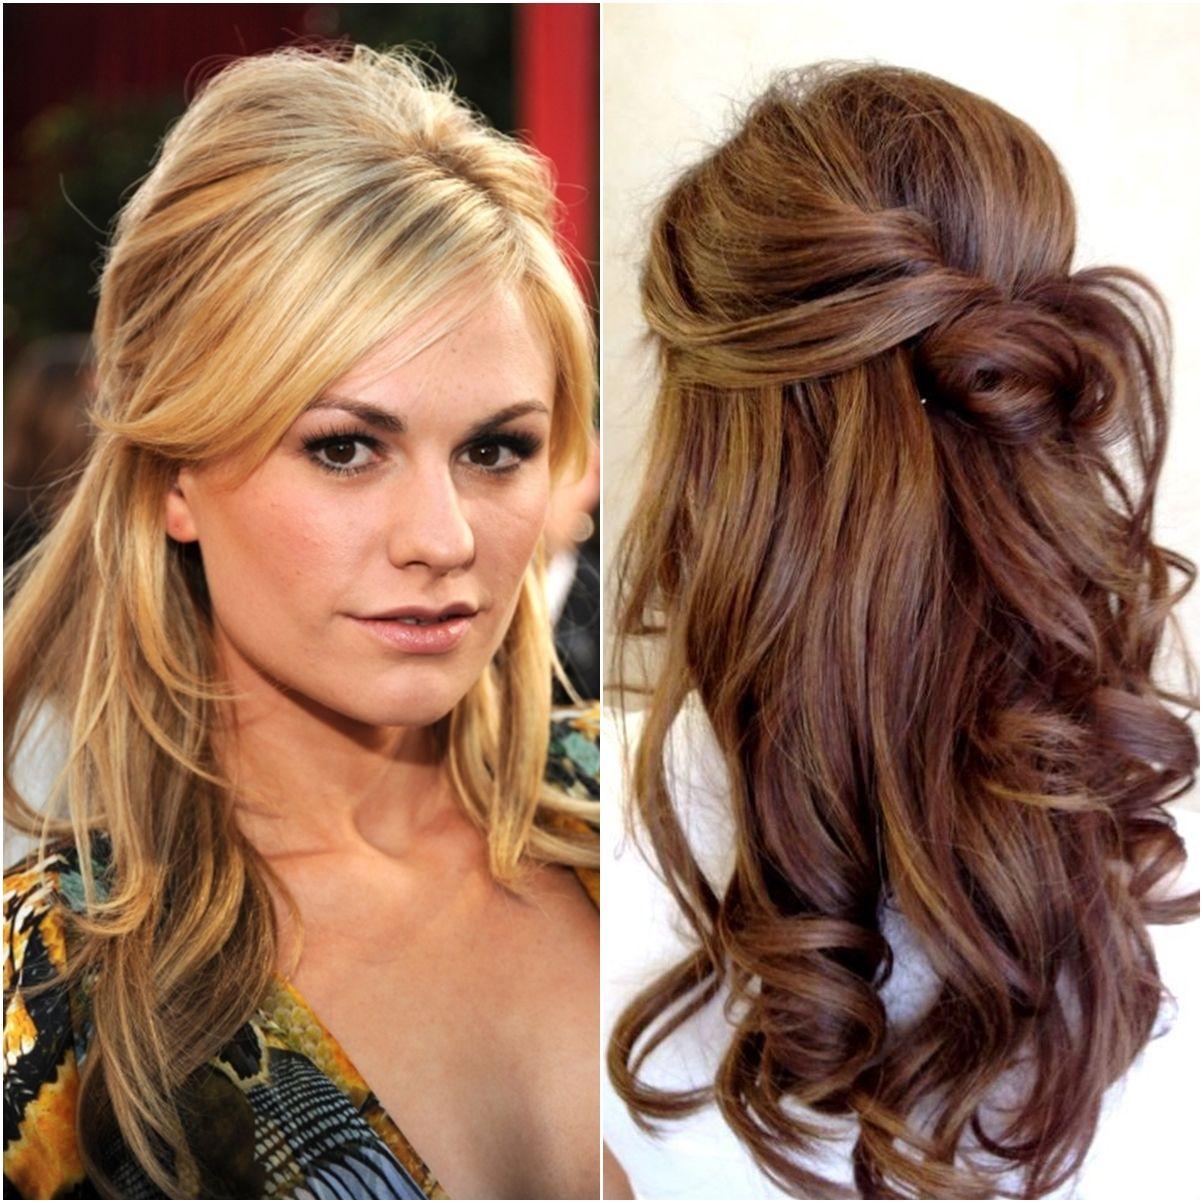 Penteados casamento cabelos curtos pesquisa do google beleza